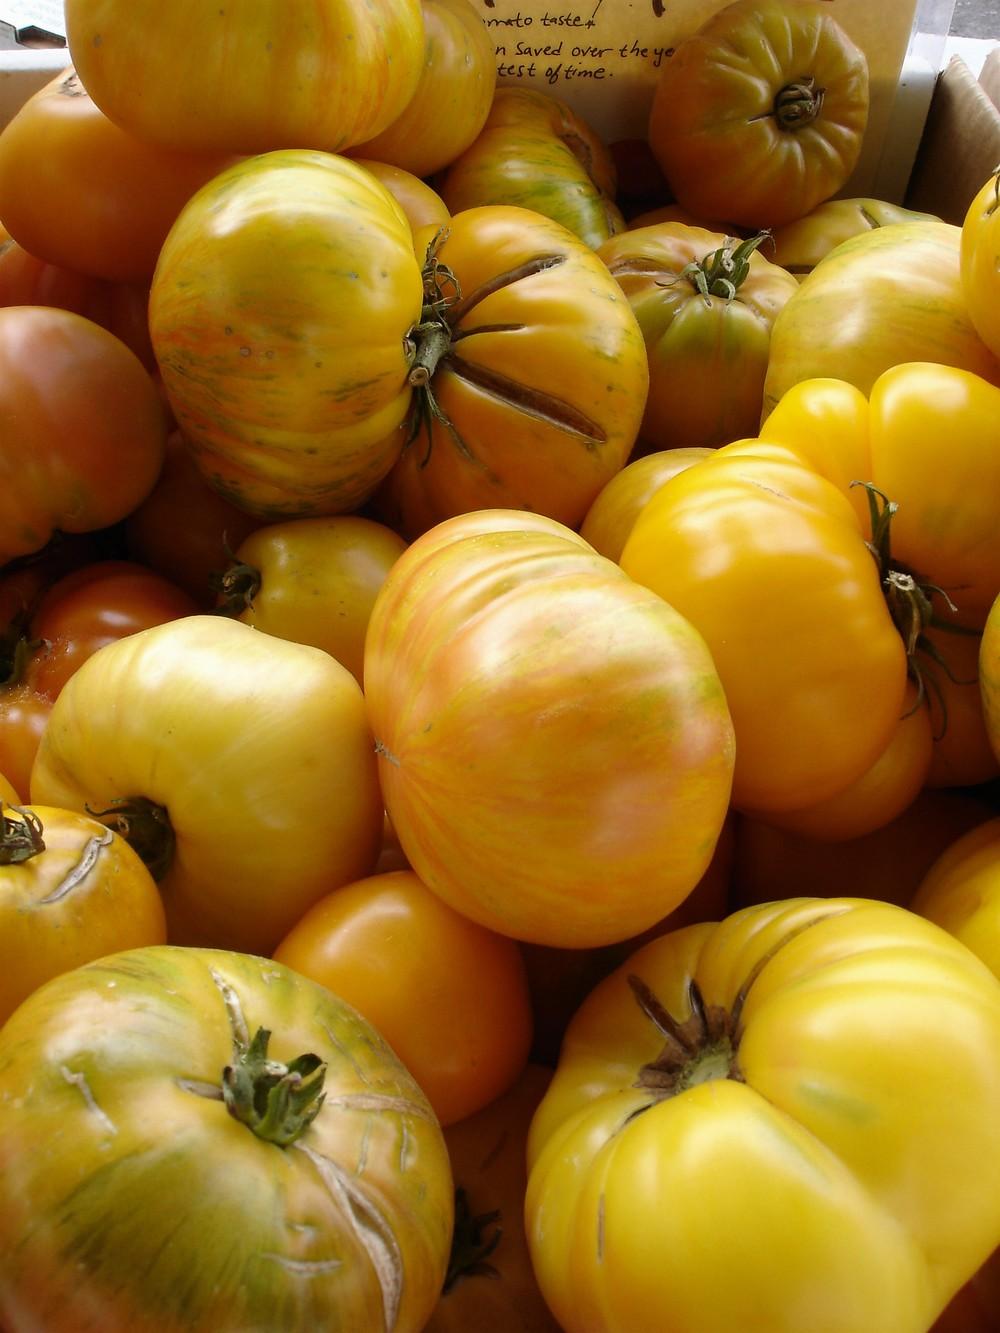 tomatoes13.jpg